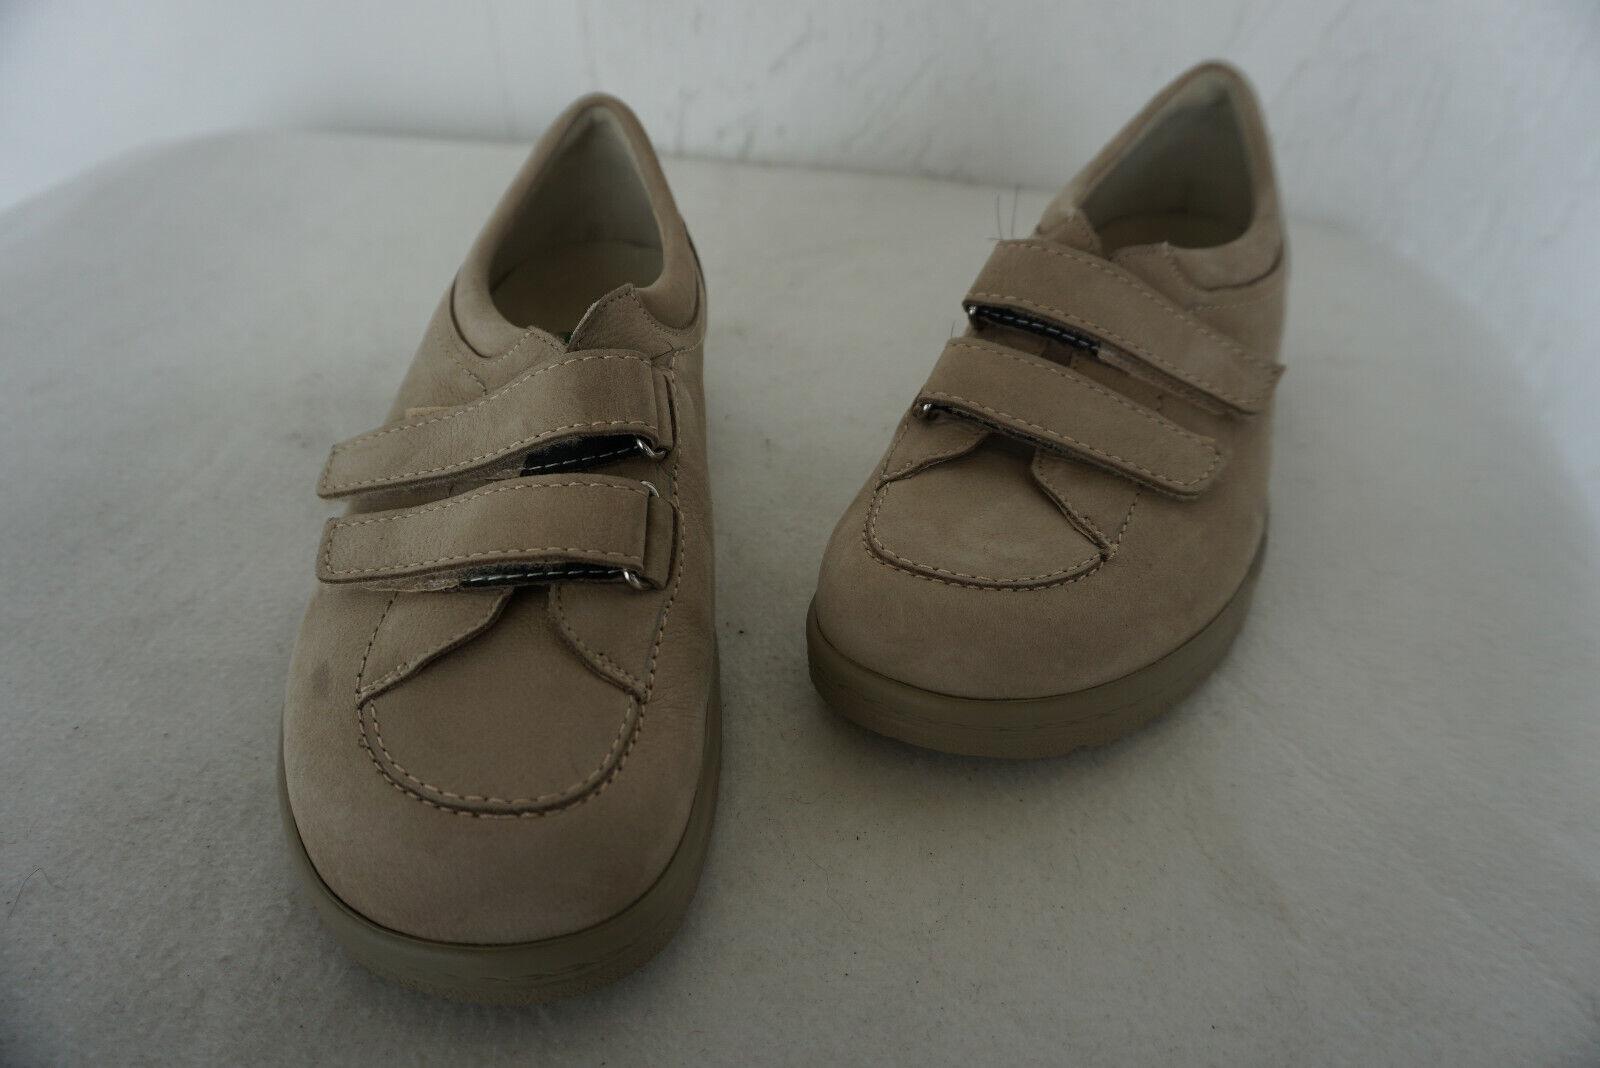 Orthopädisch Natural Feet Damen Comfort Schuhe Klett Gr.36 Beige Nubuk Leder NEU